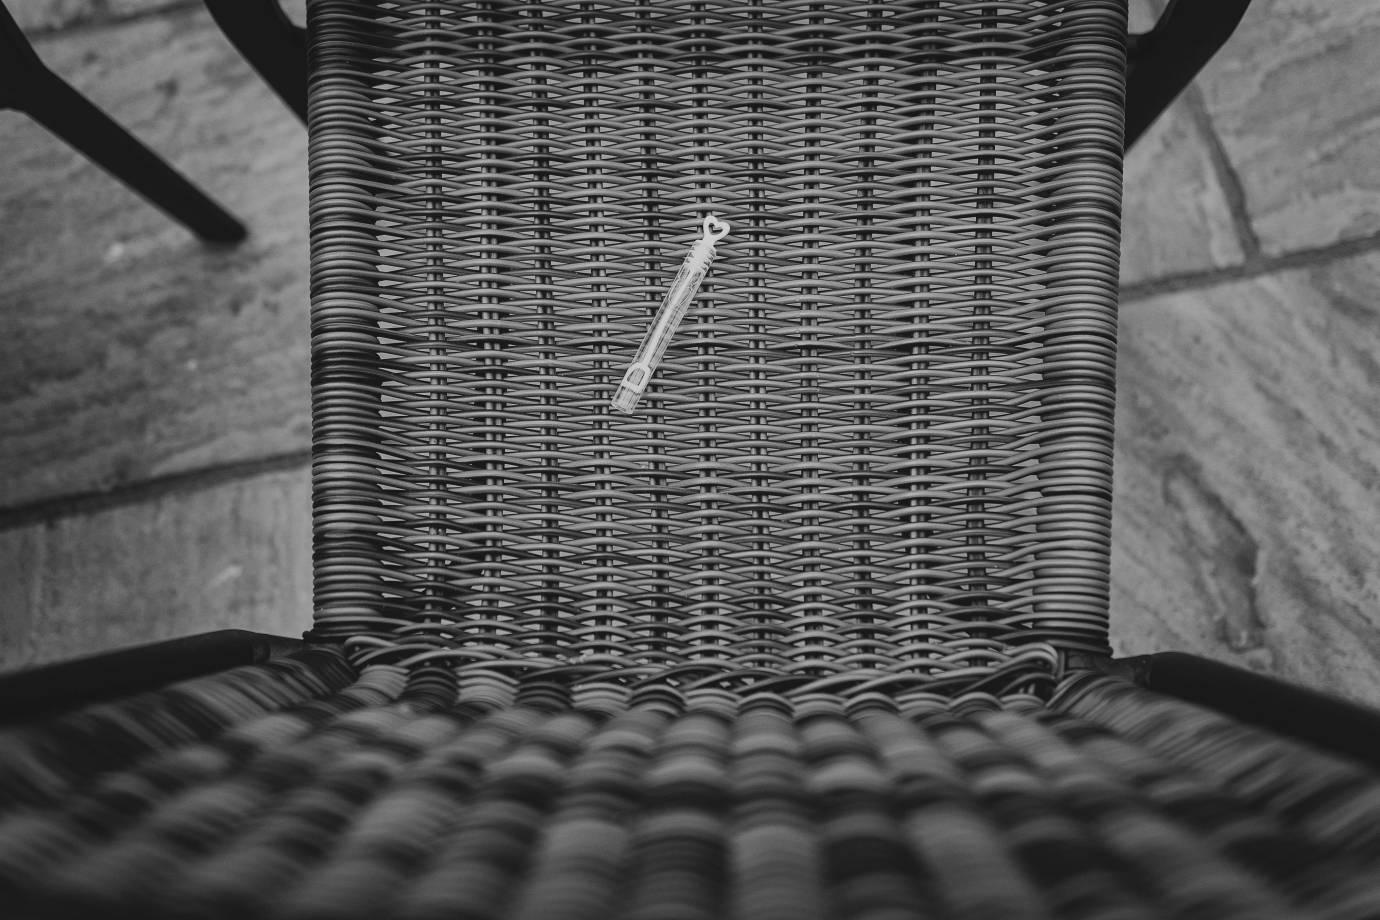 hochzeitsfotograf ganderkesee 047 - Christina+Andreas